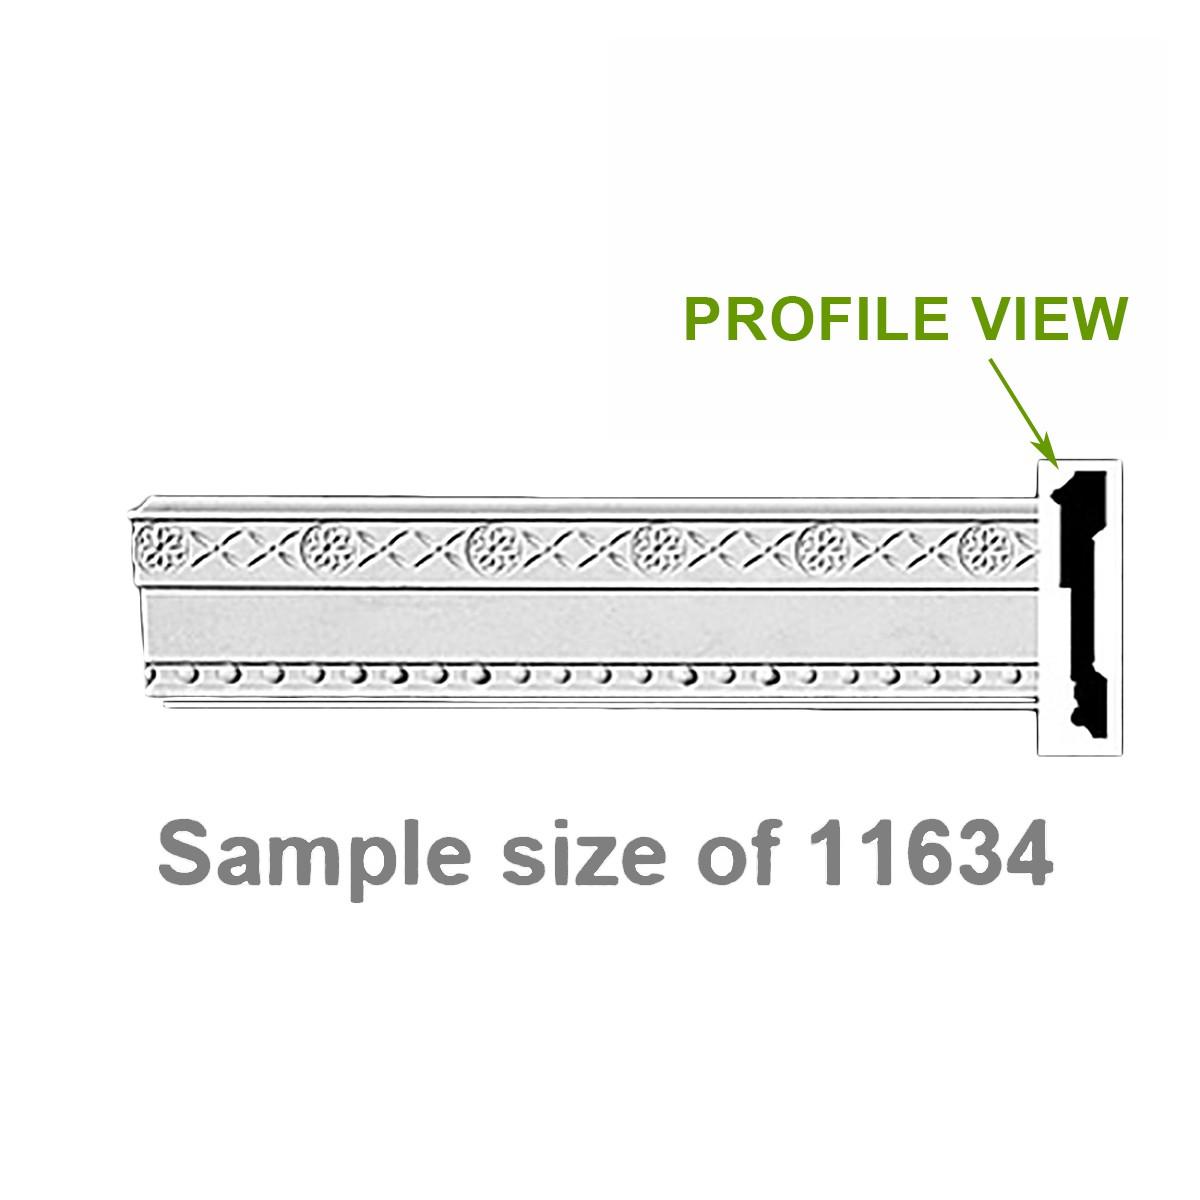 "Cornice White Urethane 24"" Sample of 11634 | Renovator's Supply"